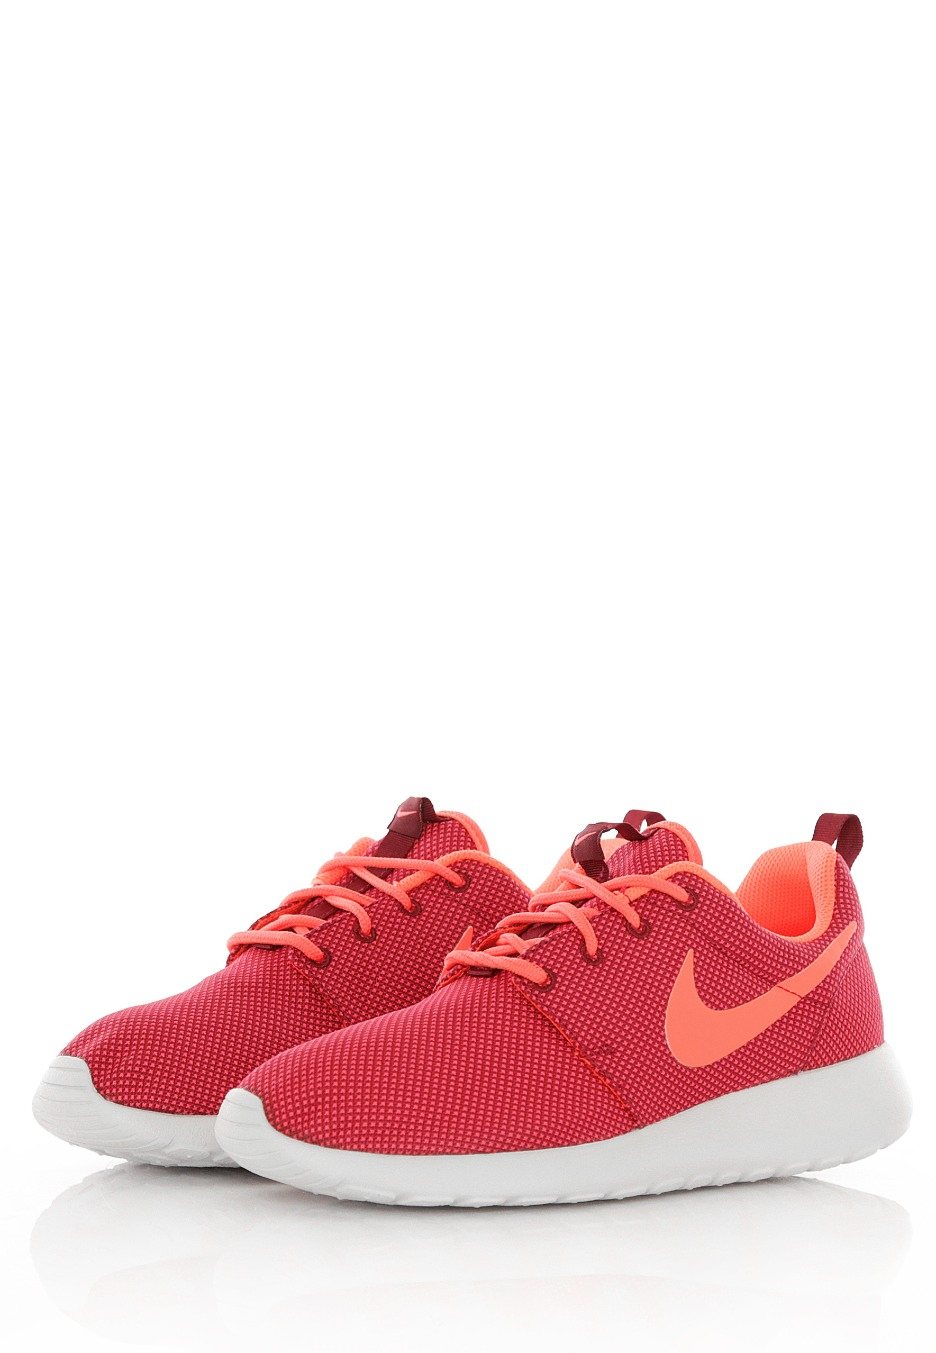 8ba22ca7a978 ... Nike - Roshe One Deep Garnet Bright Crimson Pure Platinum - Girl Shoes  ...